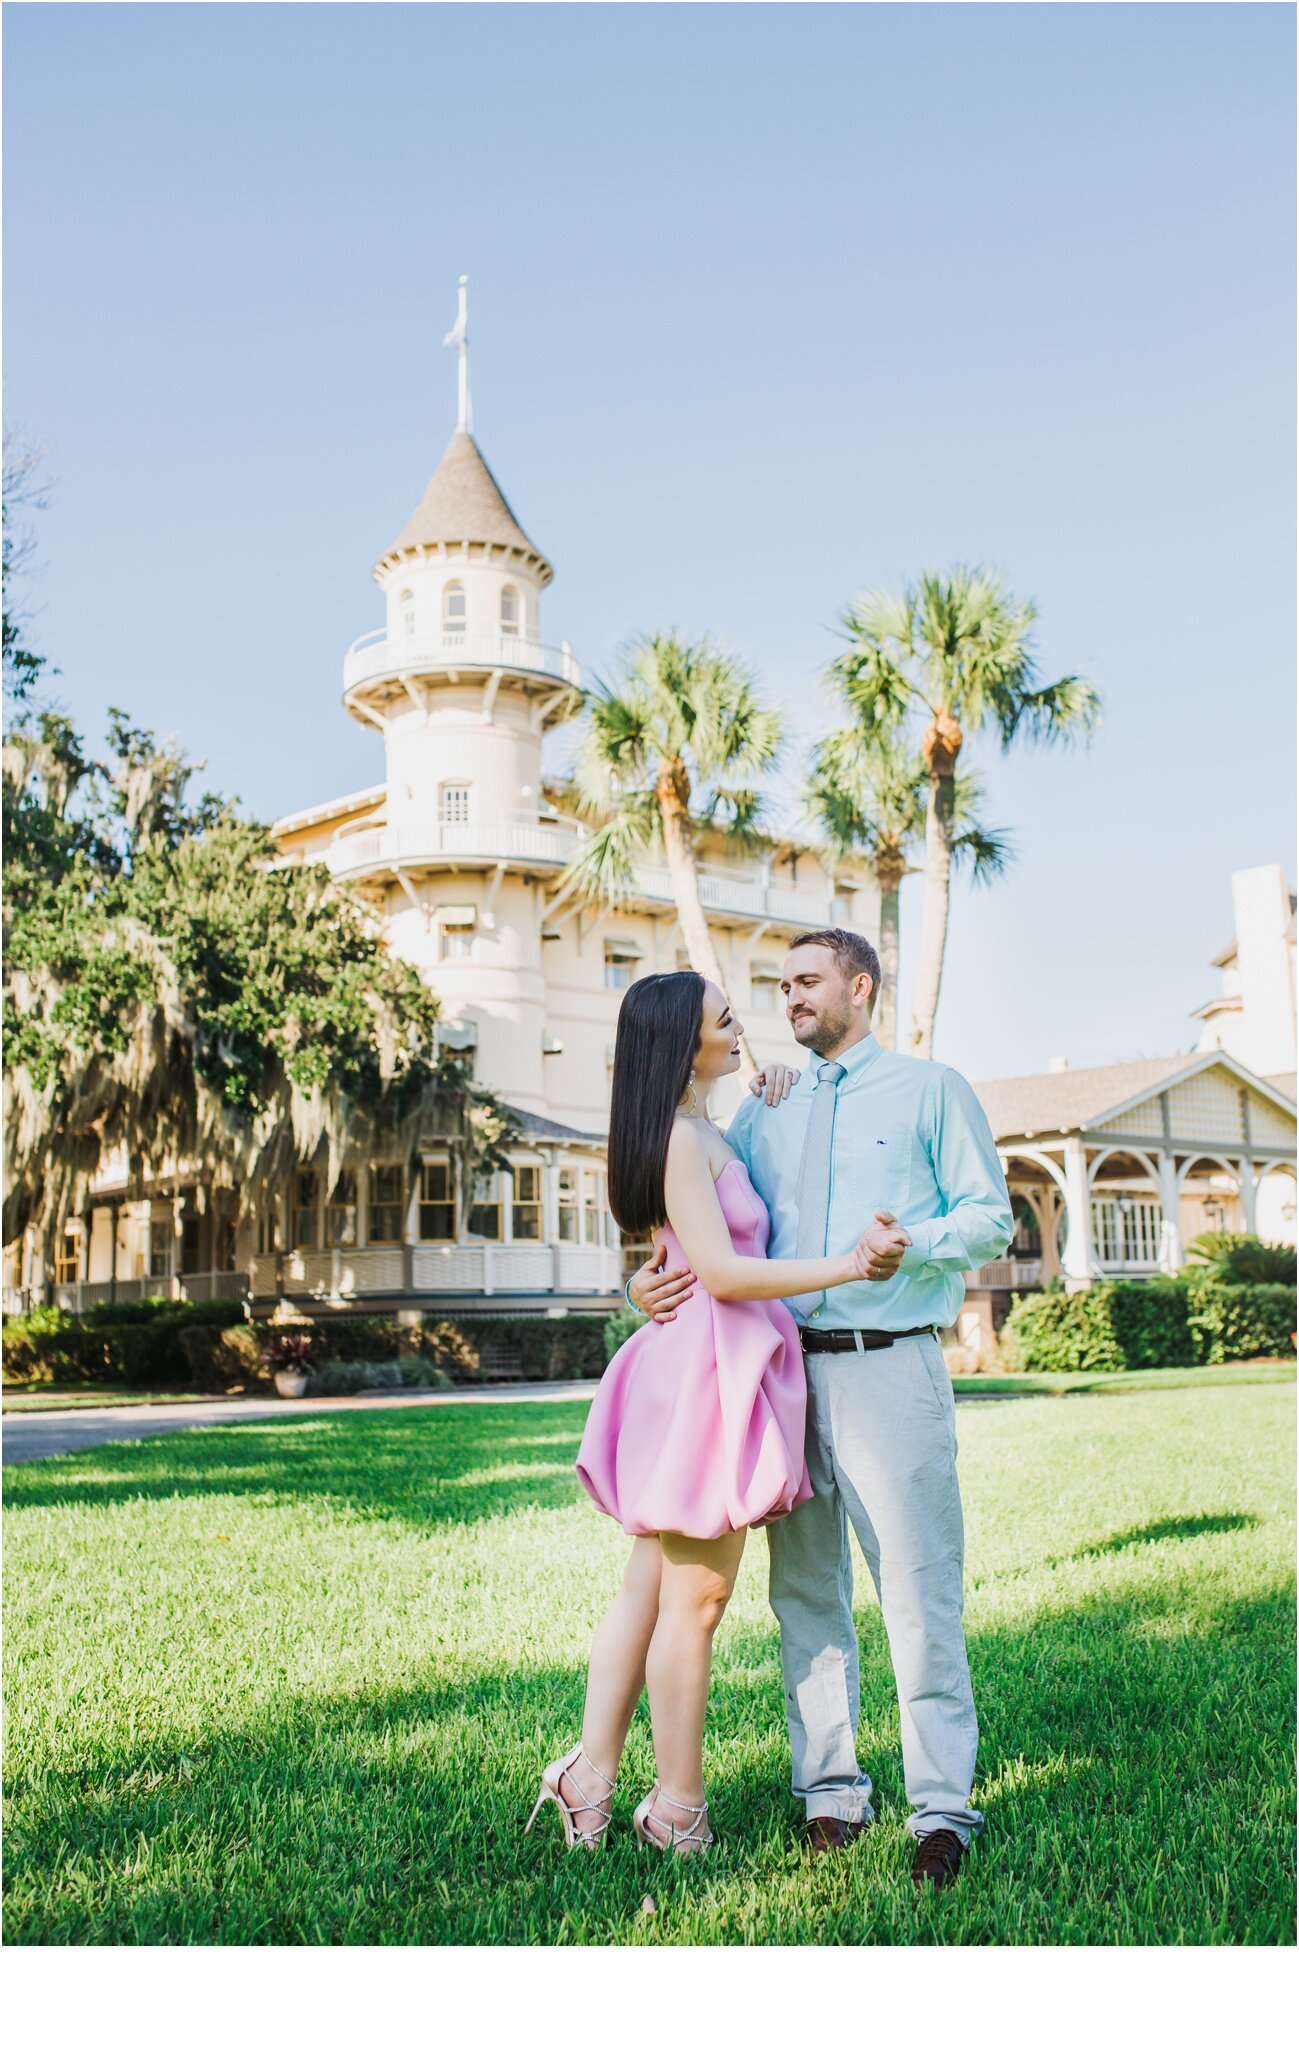 Rainey_Gregg_Photography_St._Simons_Island_Georgia_California_Wedding_Portrait_Photography_1828.jpg